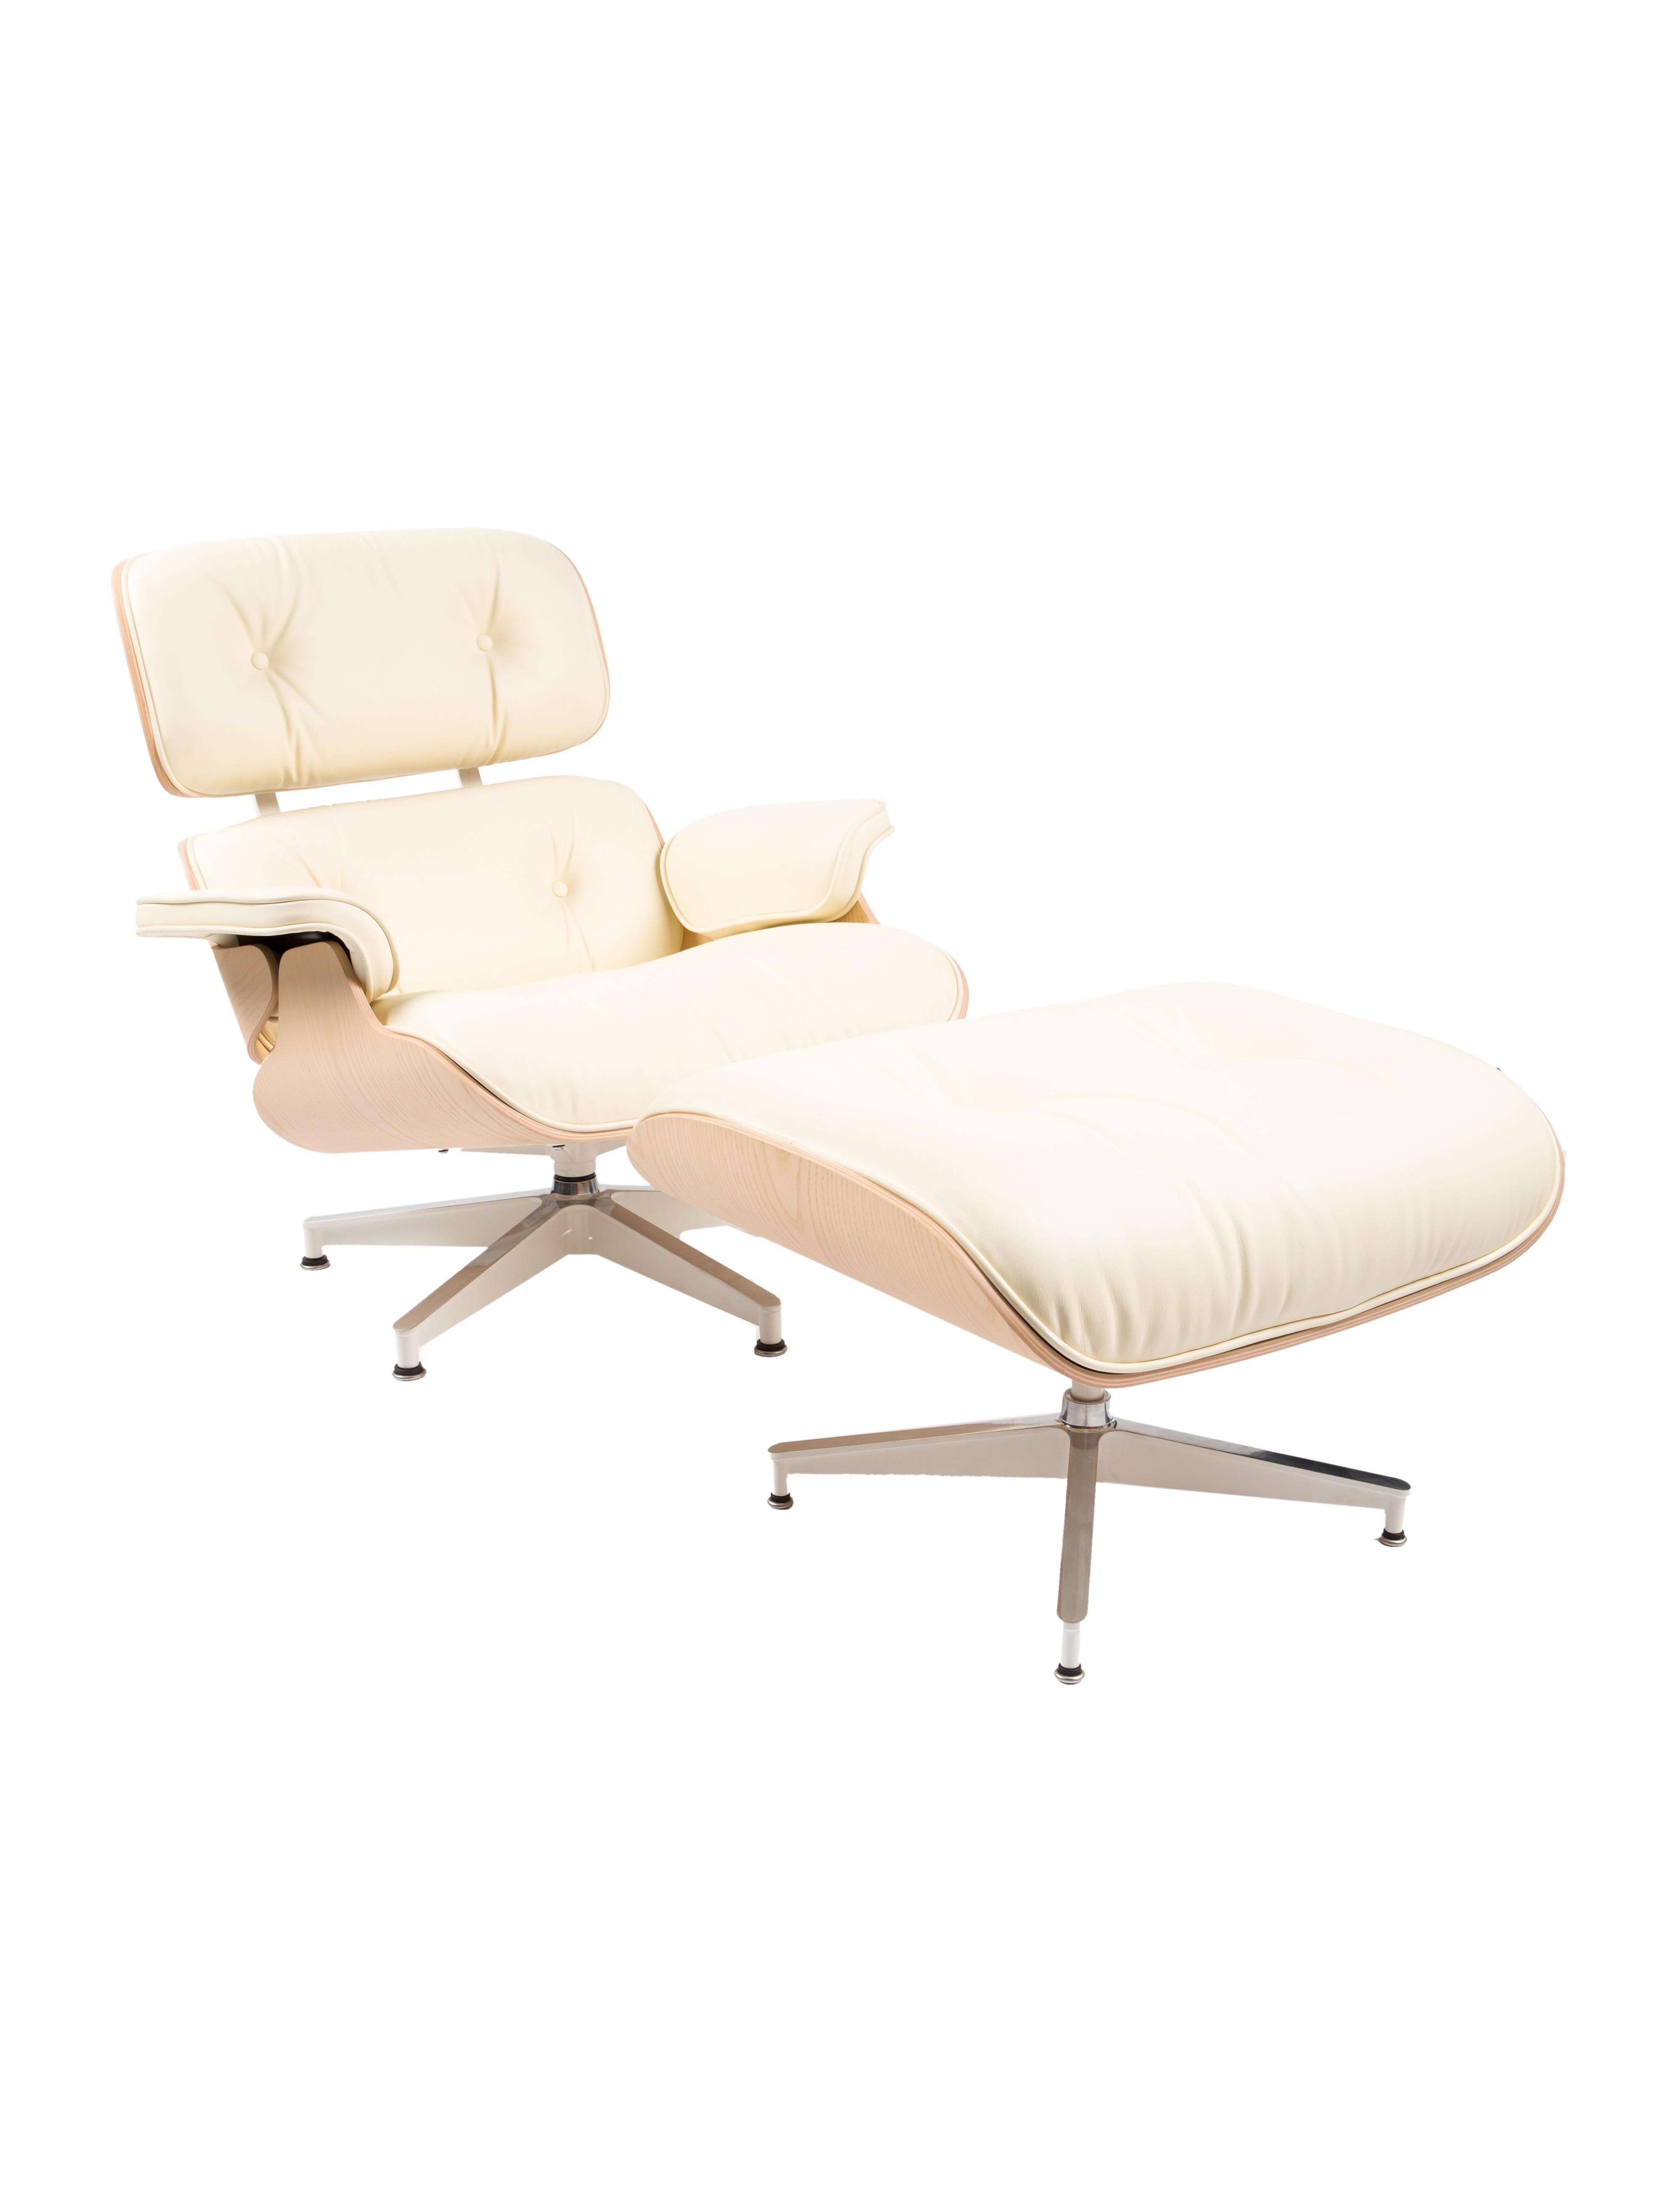 Eames For Herman Miller Lounge Chair U0026 Ottoman